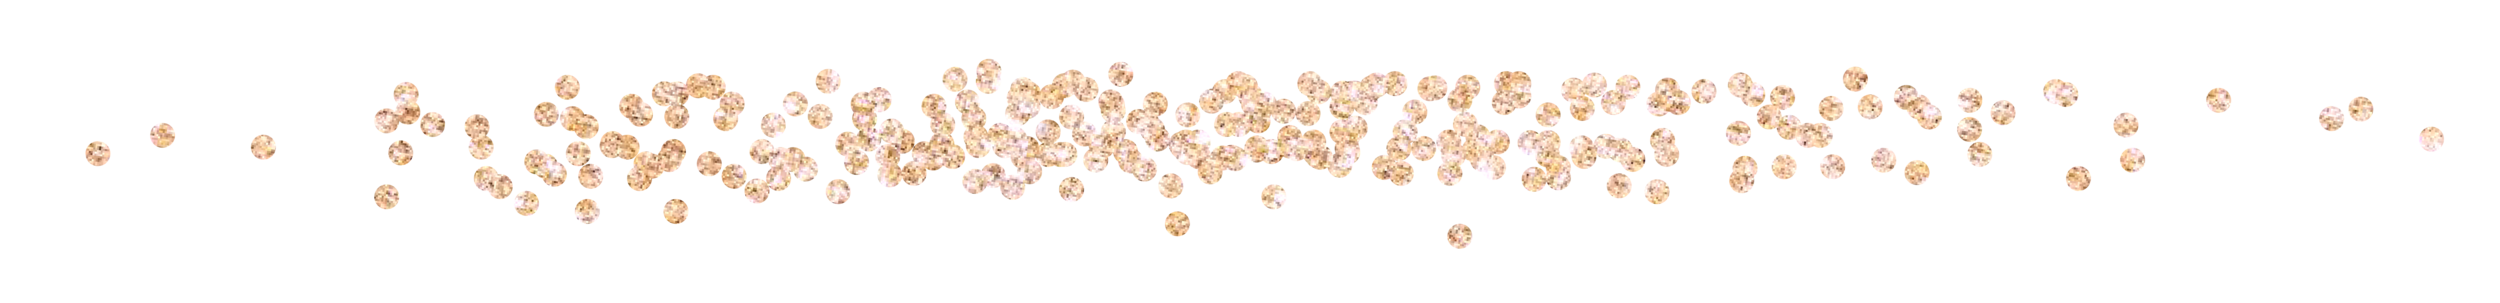 AshleyGraphics-glitterborder.png